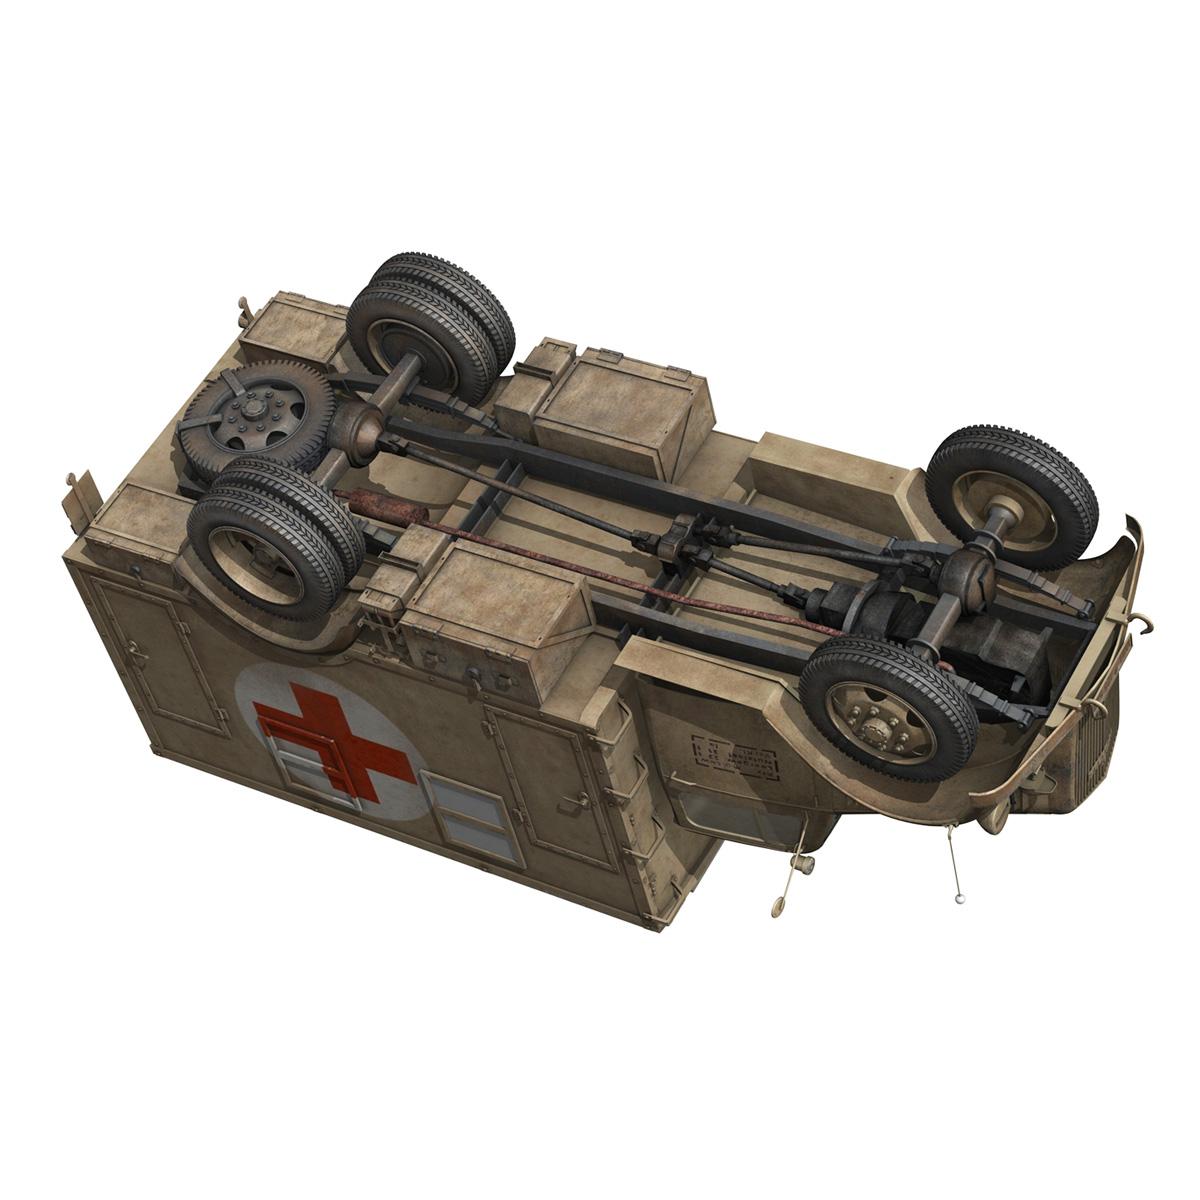 opel blitz – 3t ambulance truck – 2 pzdiv 3d model 3ds c4d fbx lwo lw lws obj 265761